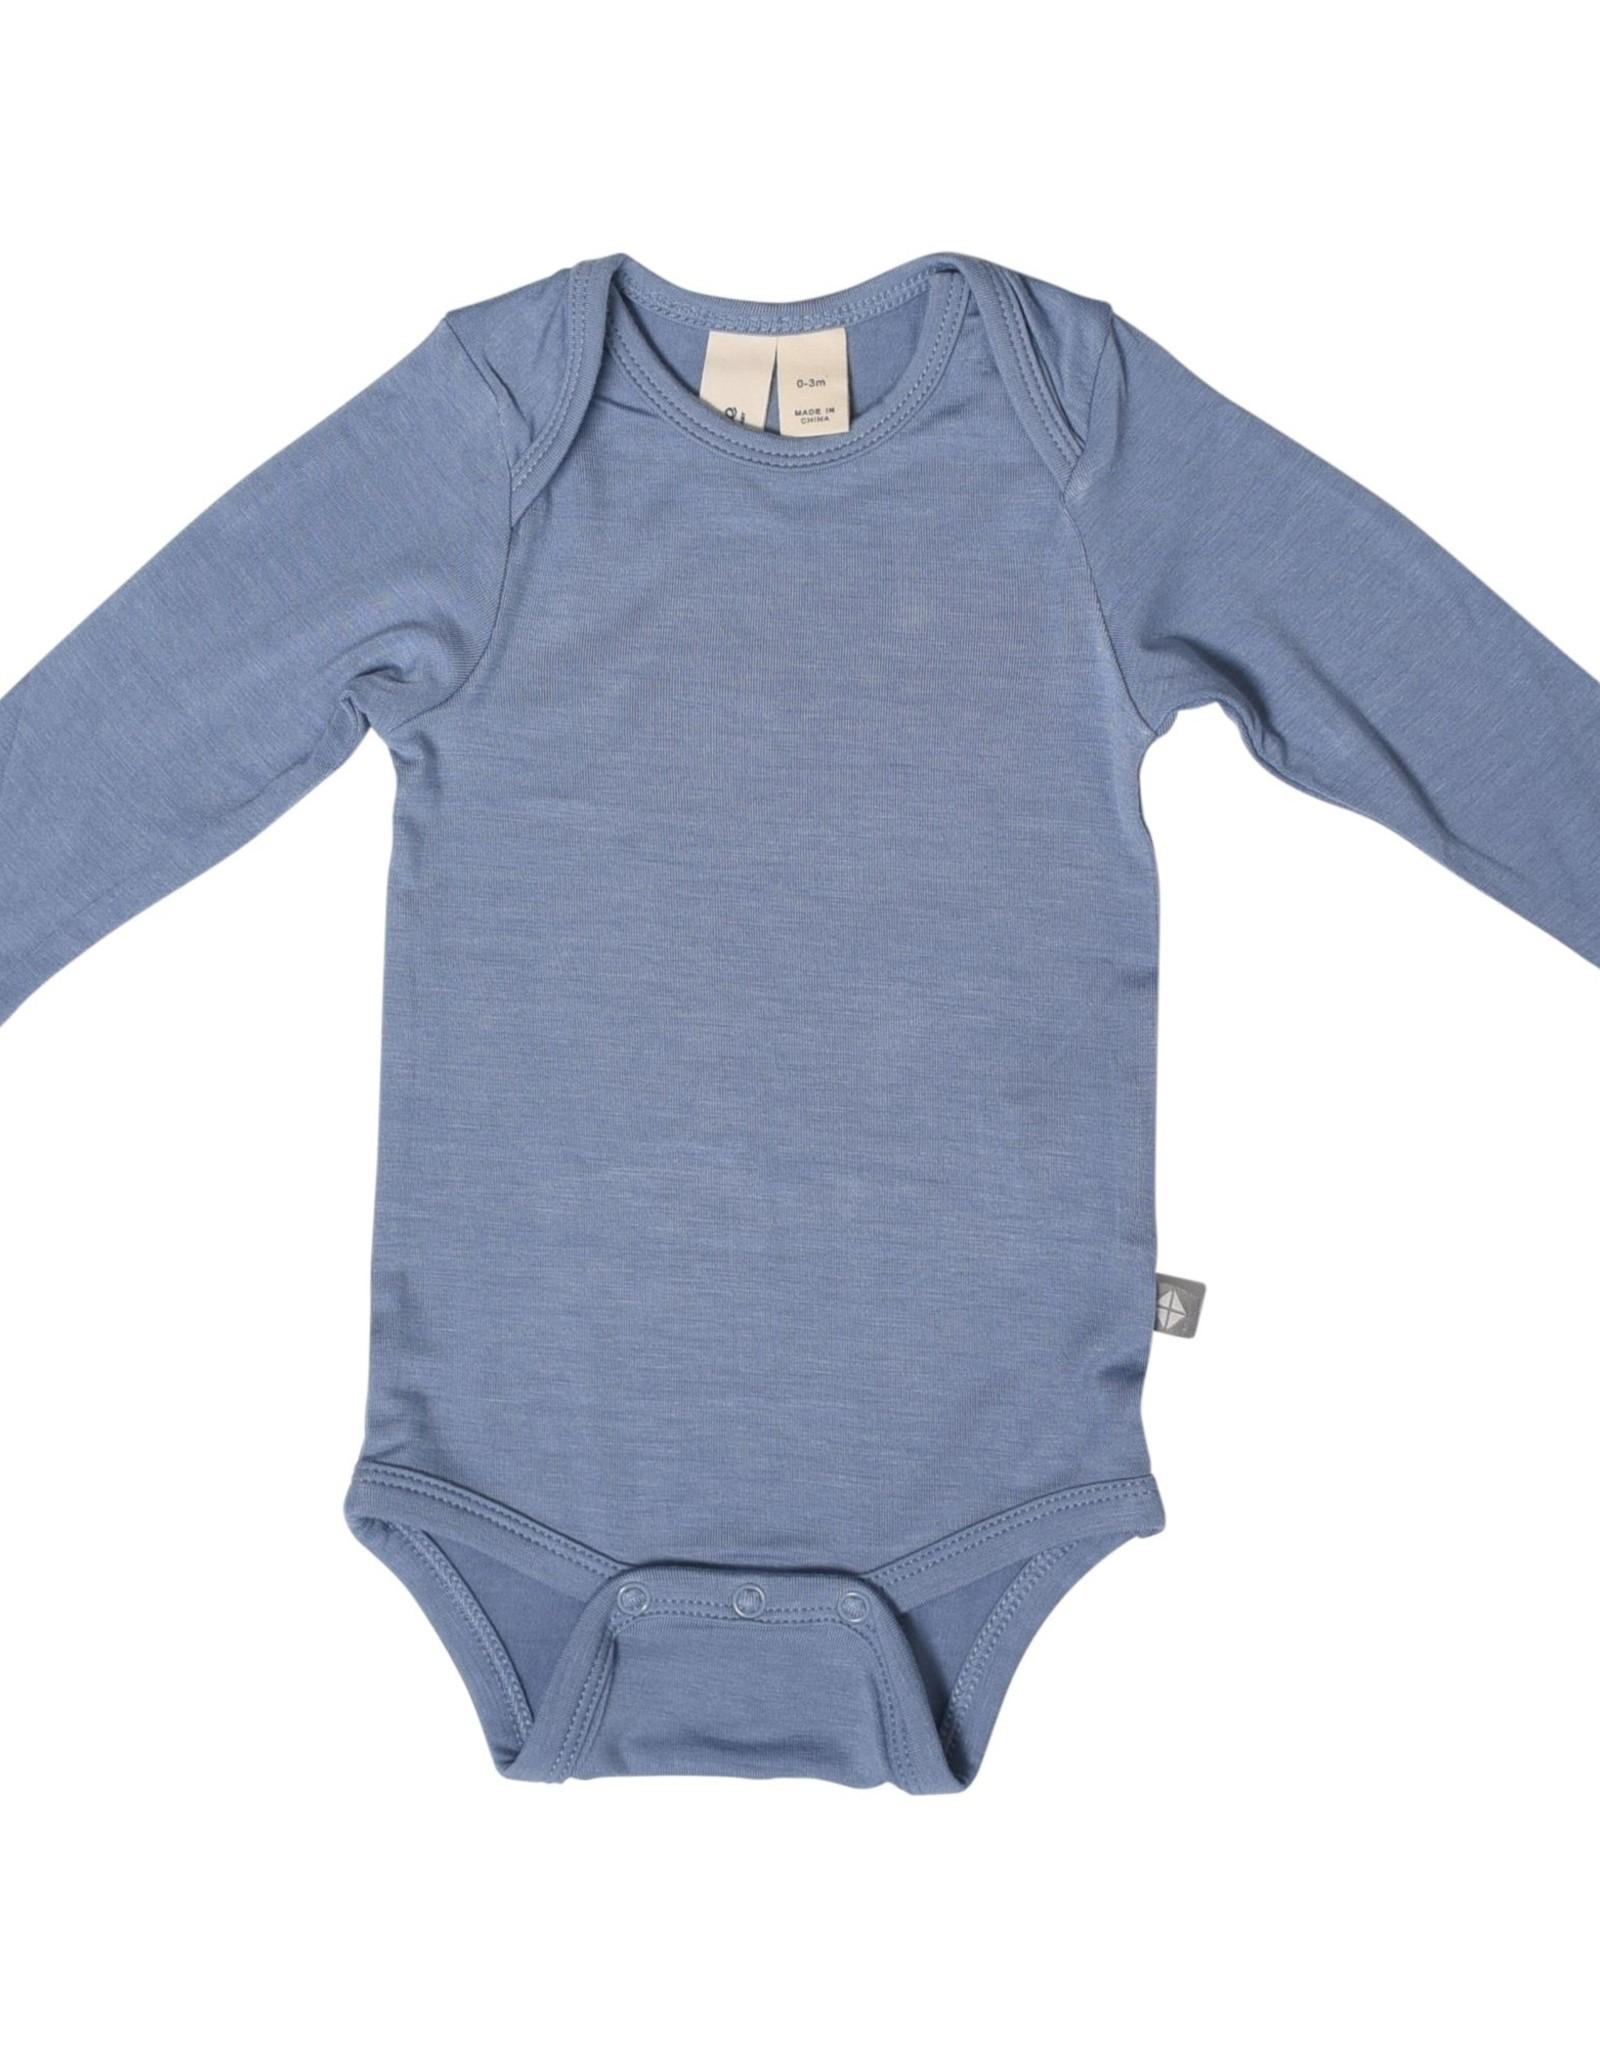 Kyte Baby l/s bodysuit - slate